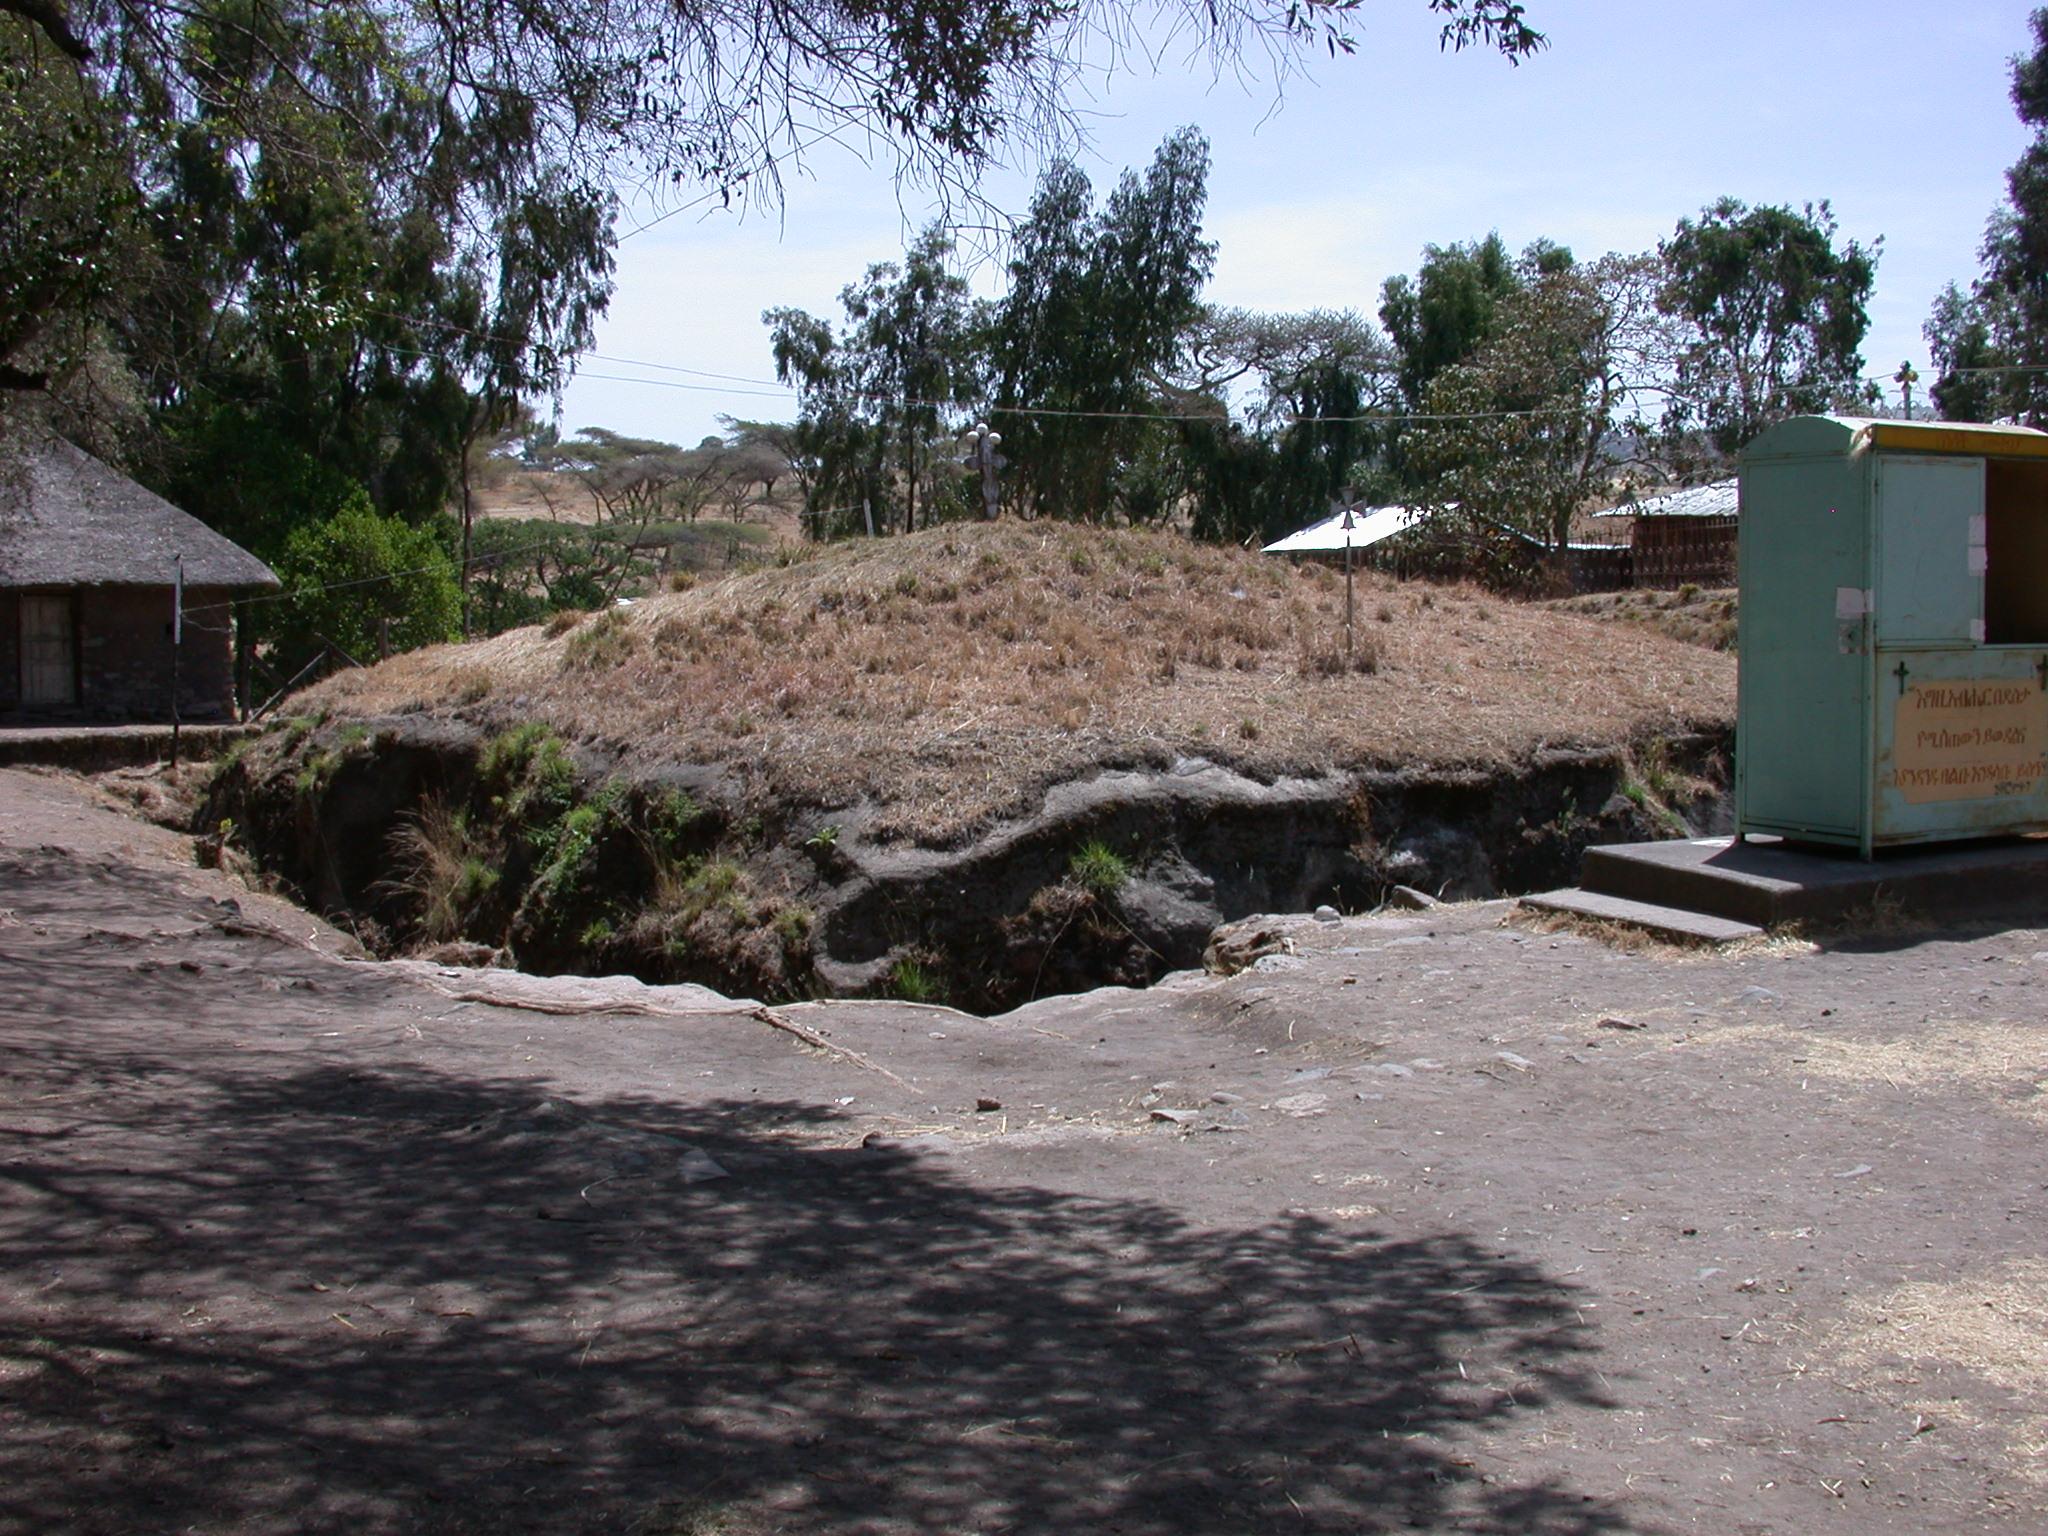 Grassy Topsoil Left to Protect Adadi Mariam Church, South of Addis Ababa, Ethiopia